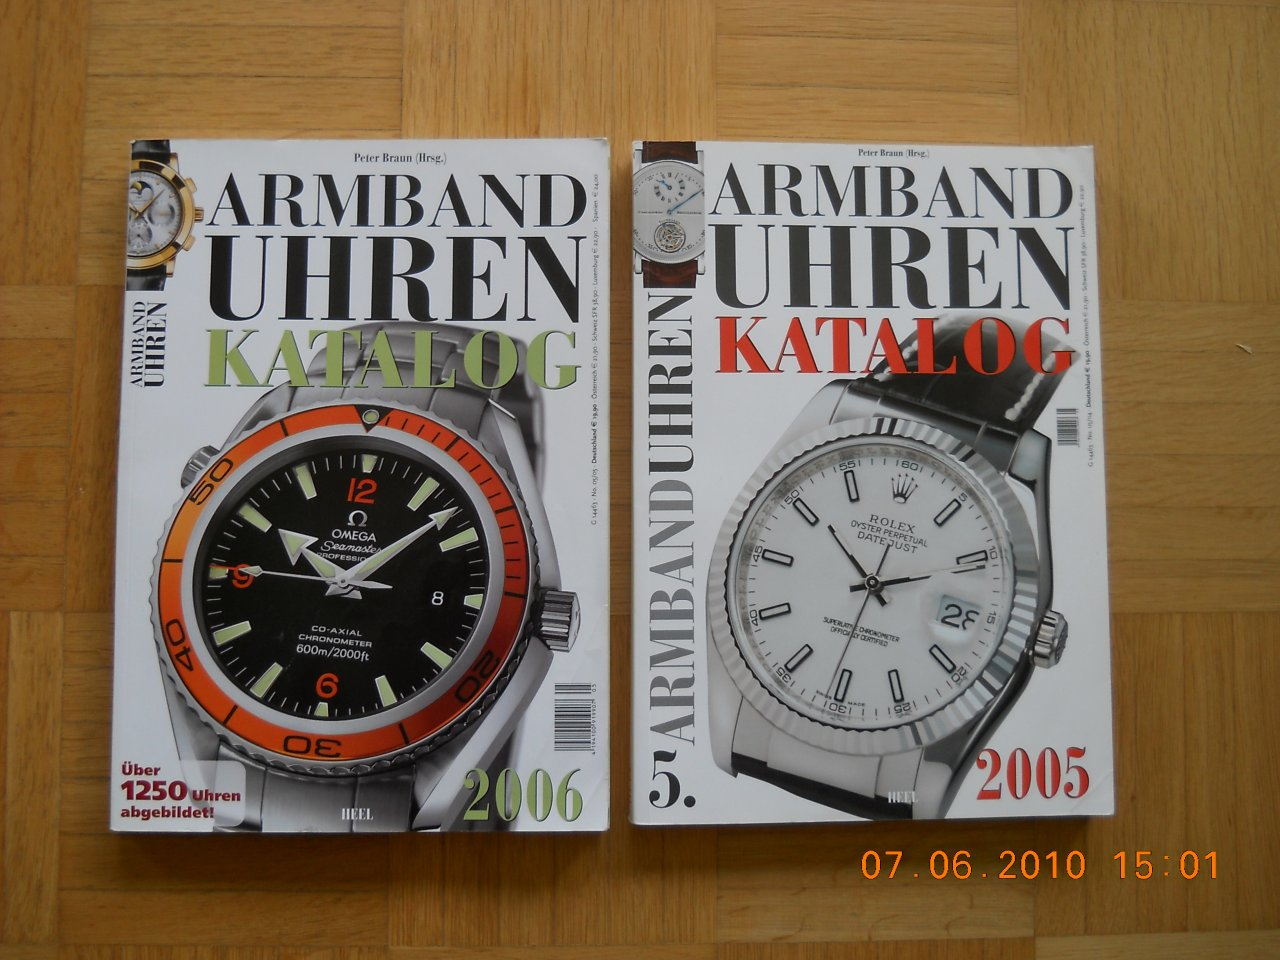 Verkauf] Armbanduhren Kataloge Peter Braun - UhrForum